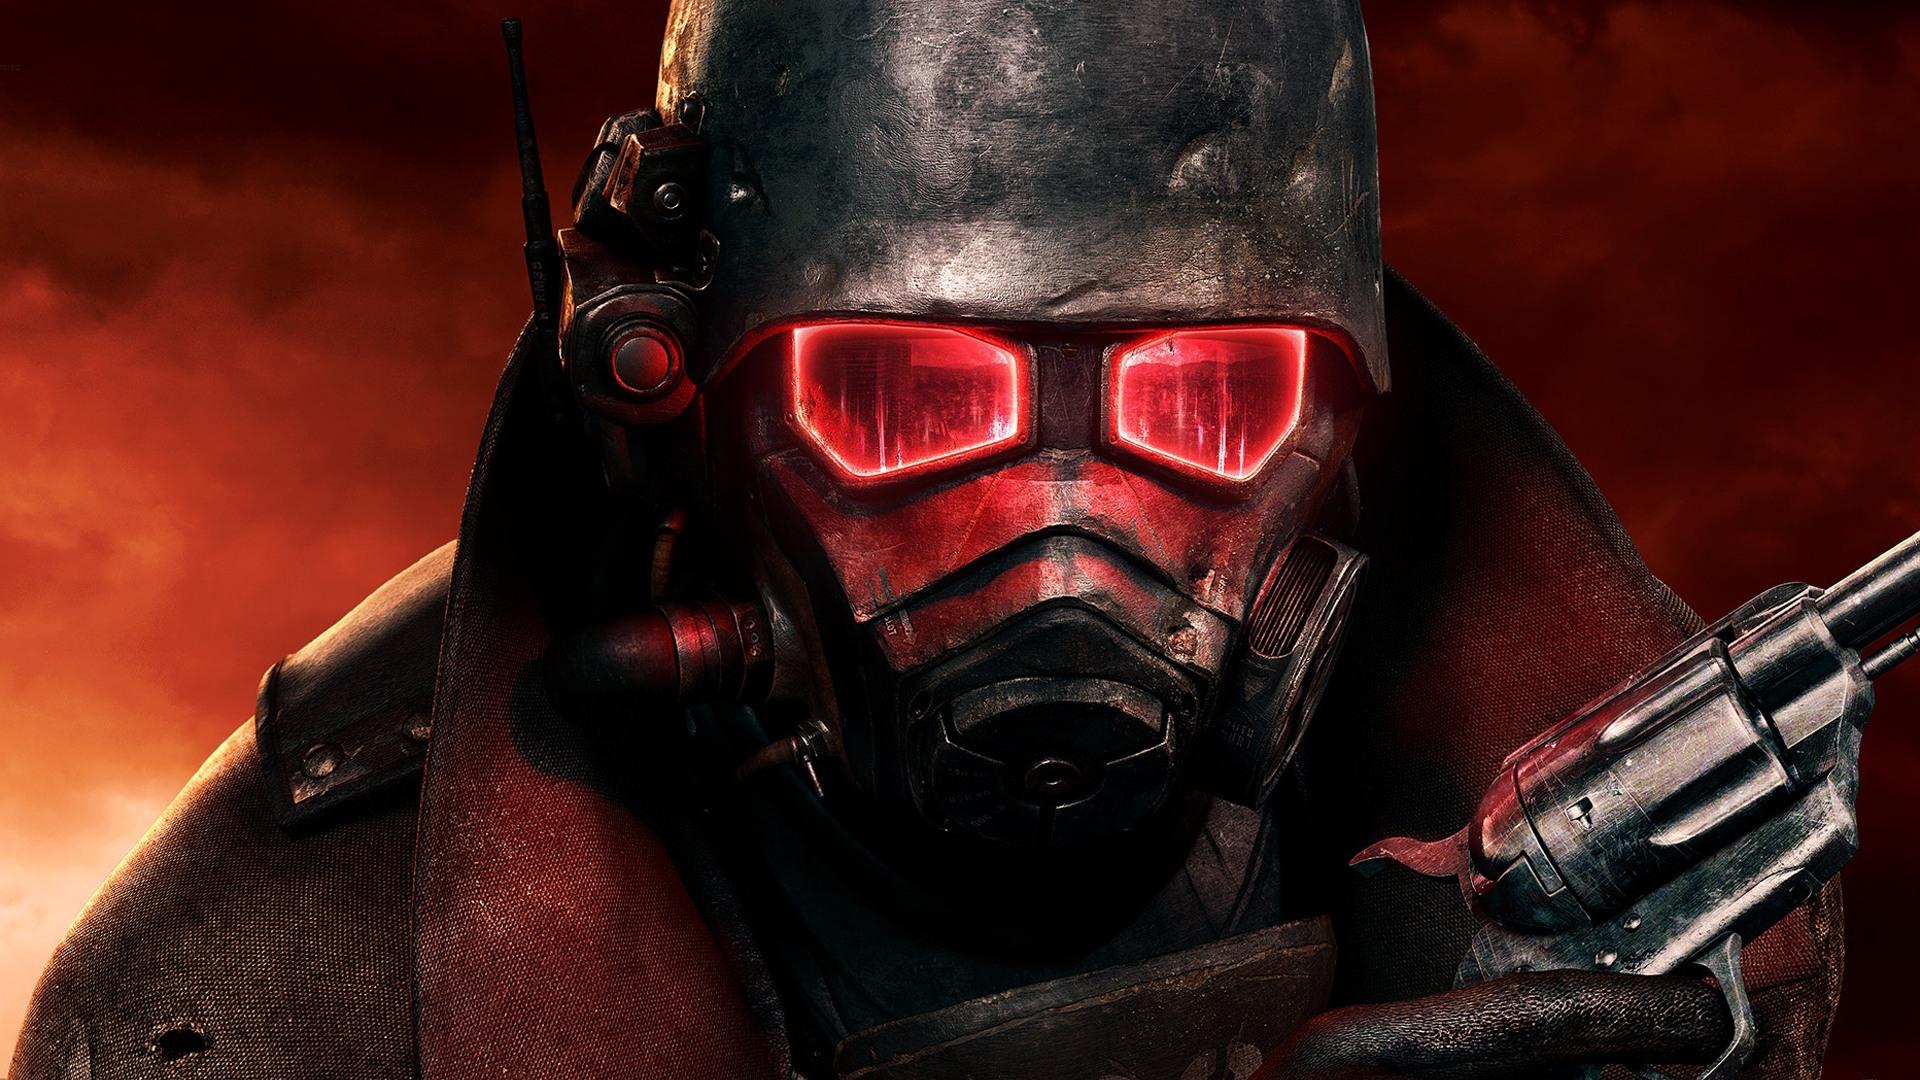 058-Fallout-New-Vegas